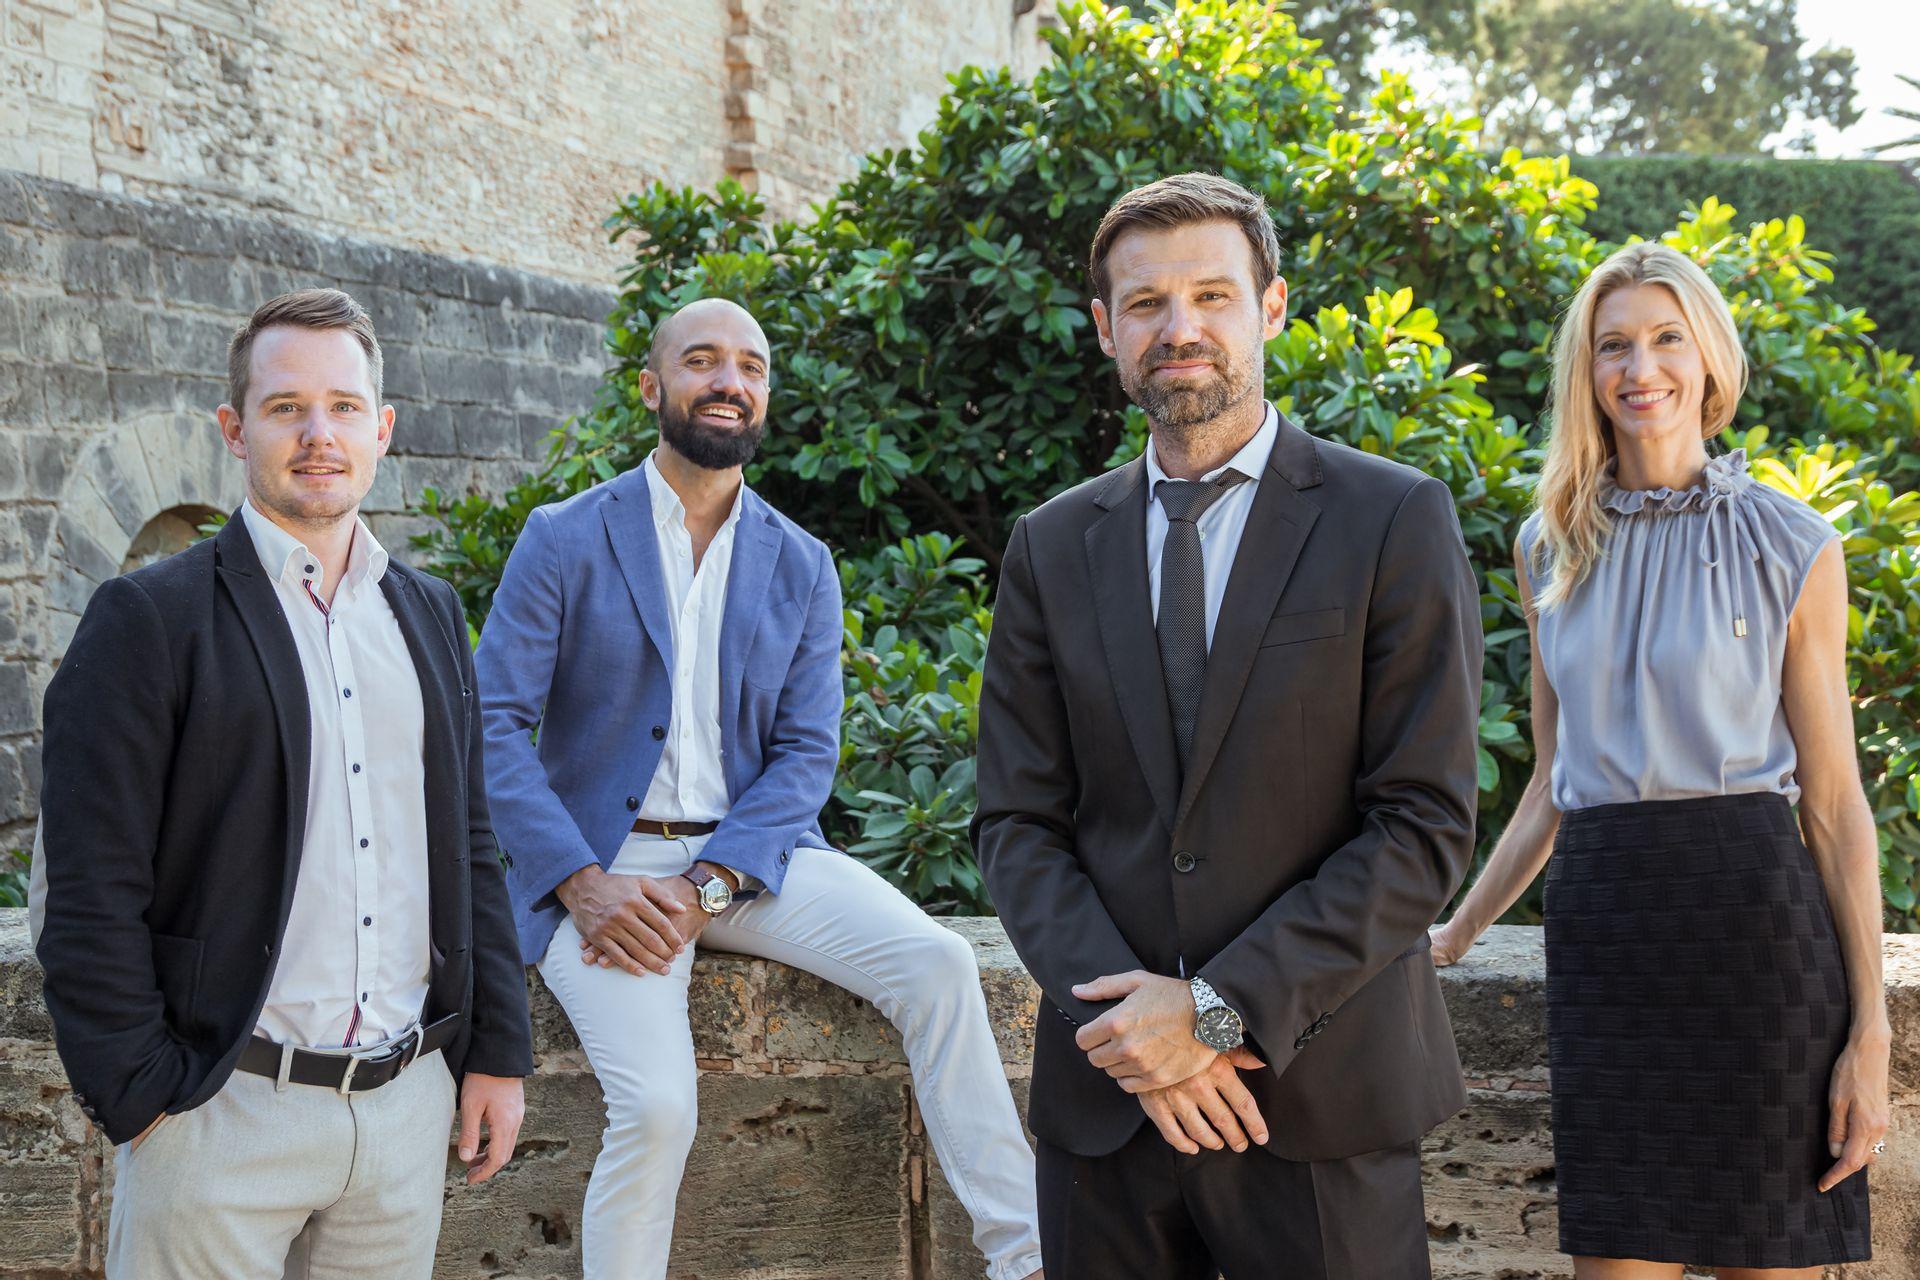 Palma de Mallorca: DAHLER & COMPANY eröffnet ein weiteres Büro auf Mallorca